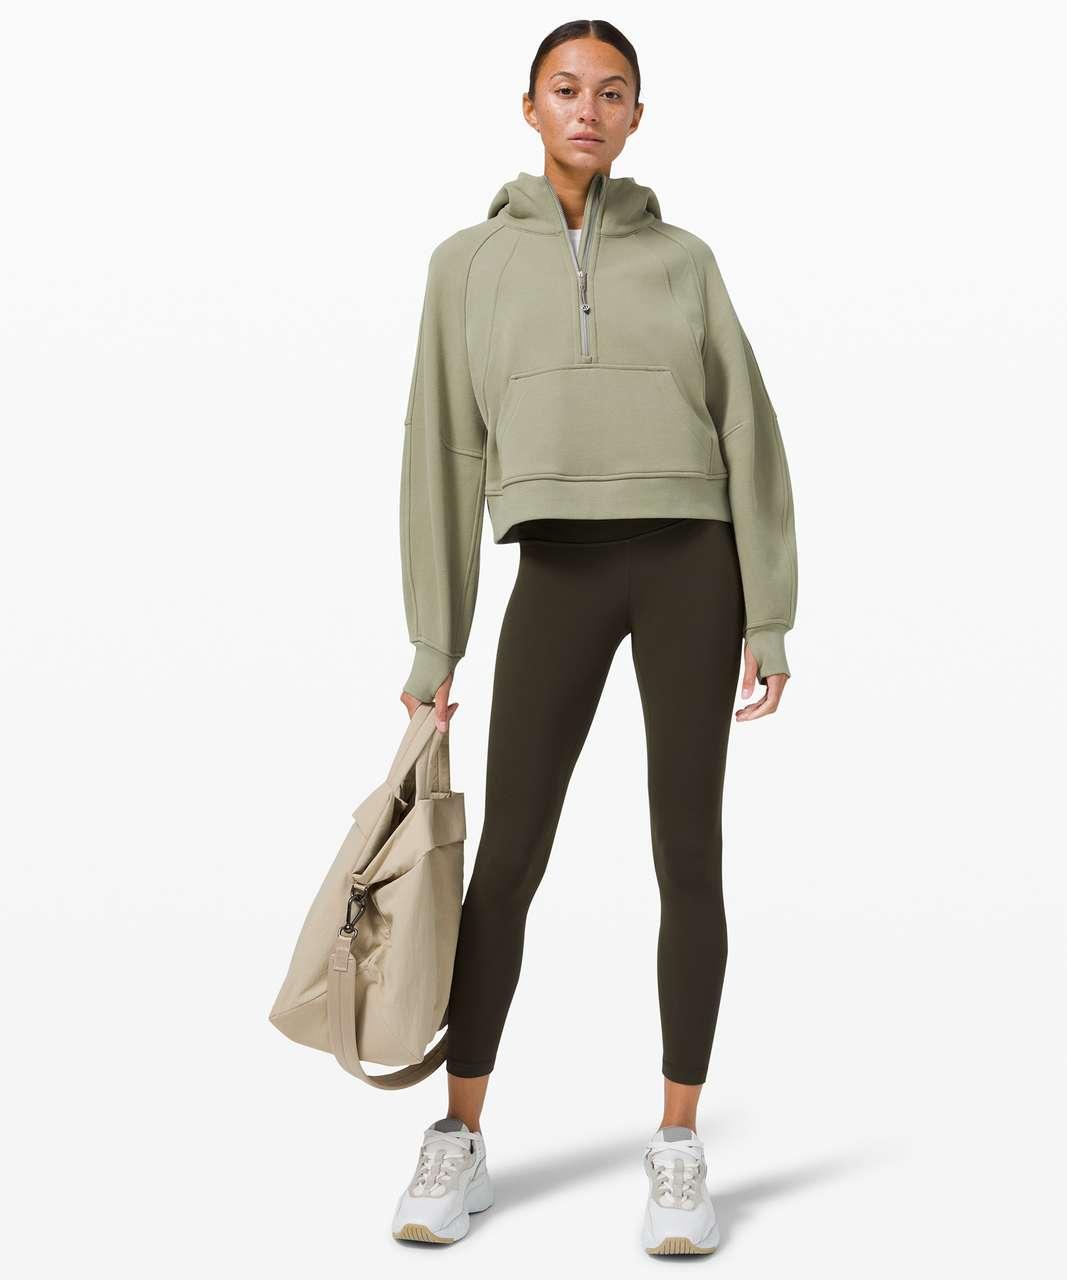 Lululemon Scuba Oversized 1/2 Zip Hoodie - Rosemary Green